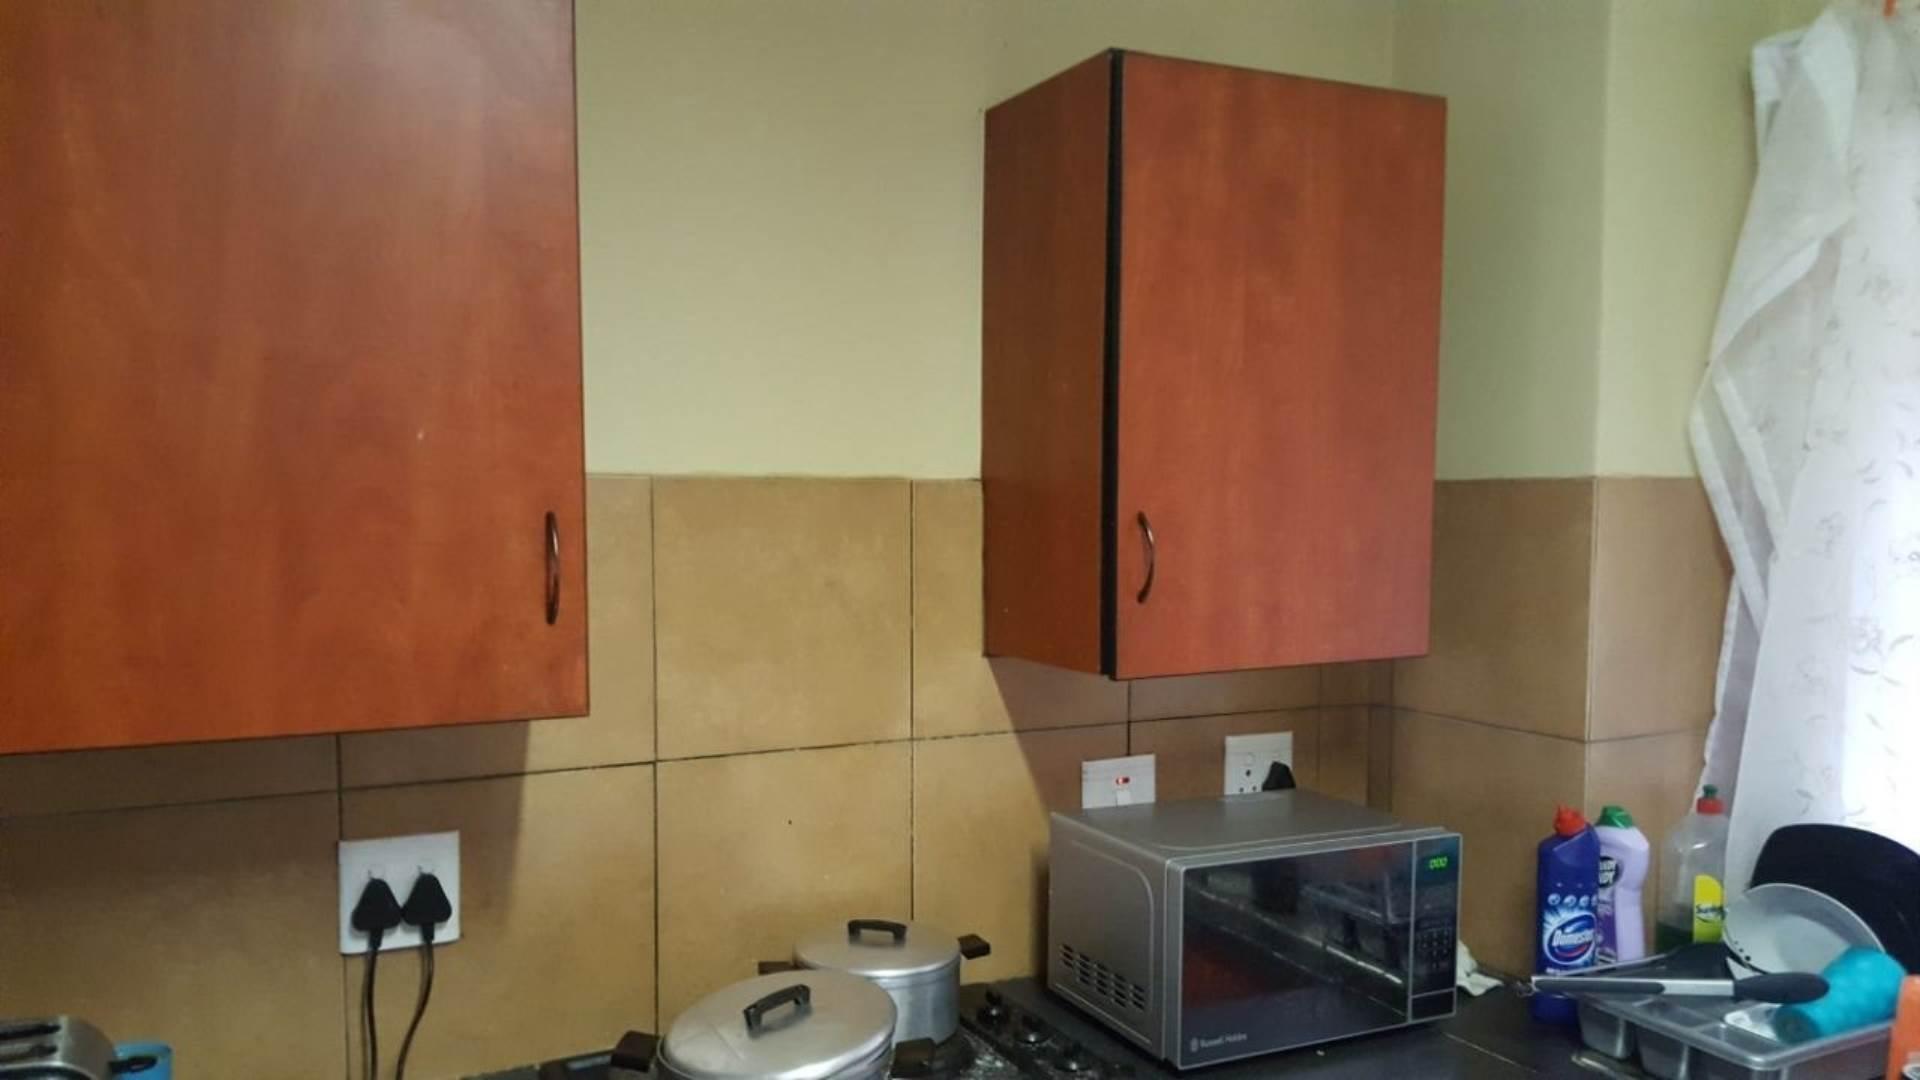 Akasia, Clarina Property  | Houses For Sale Clarina, CLARINA, Apartment 2 bedrooms property for sale Price:380,000